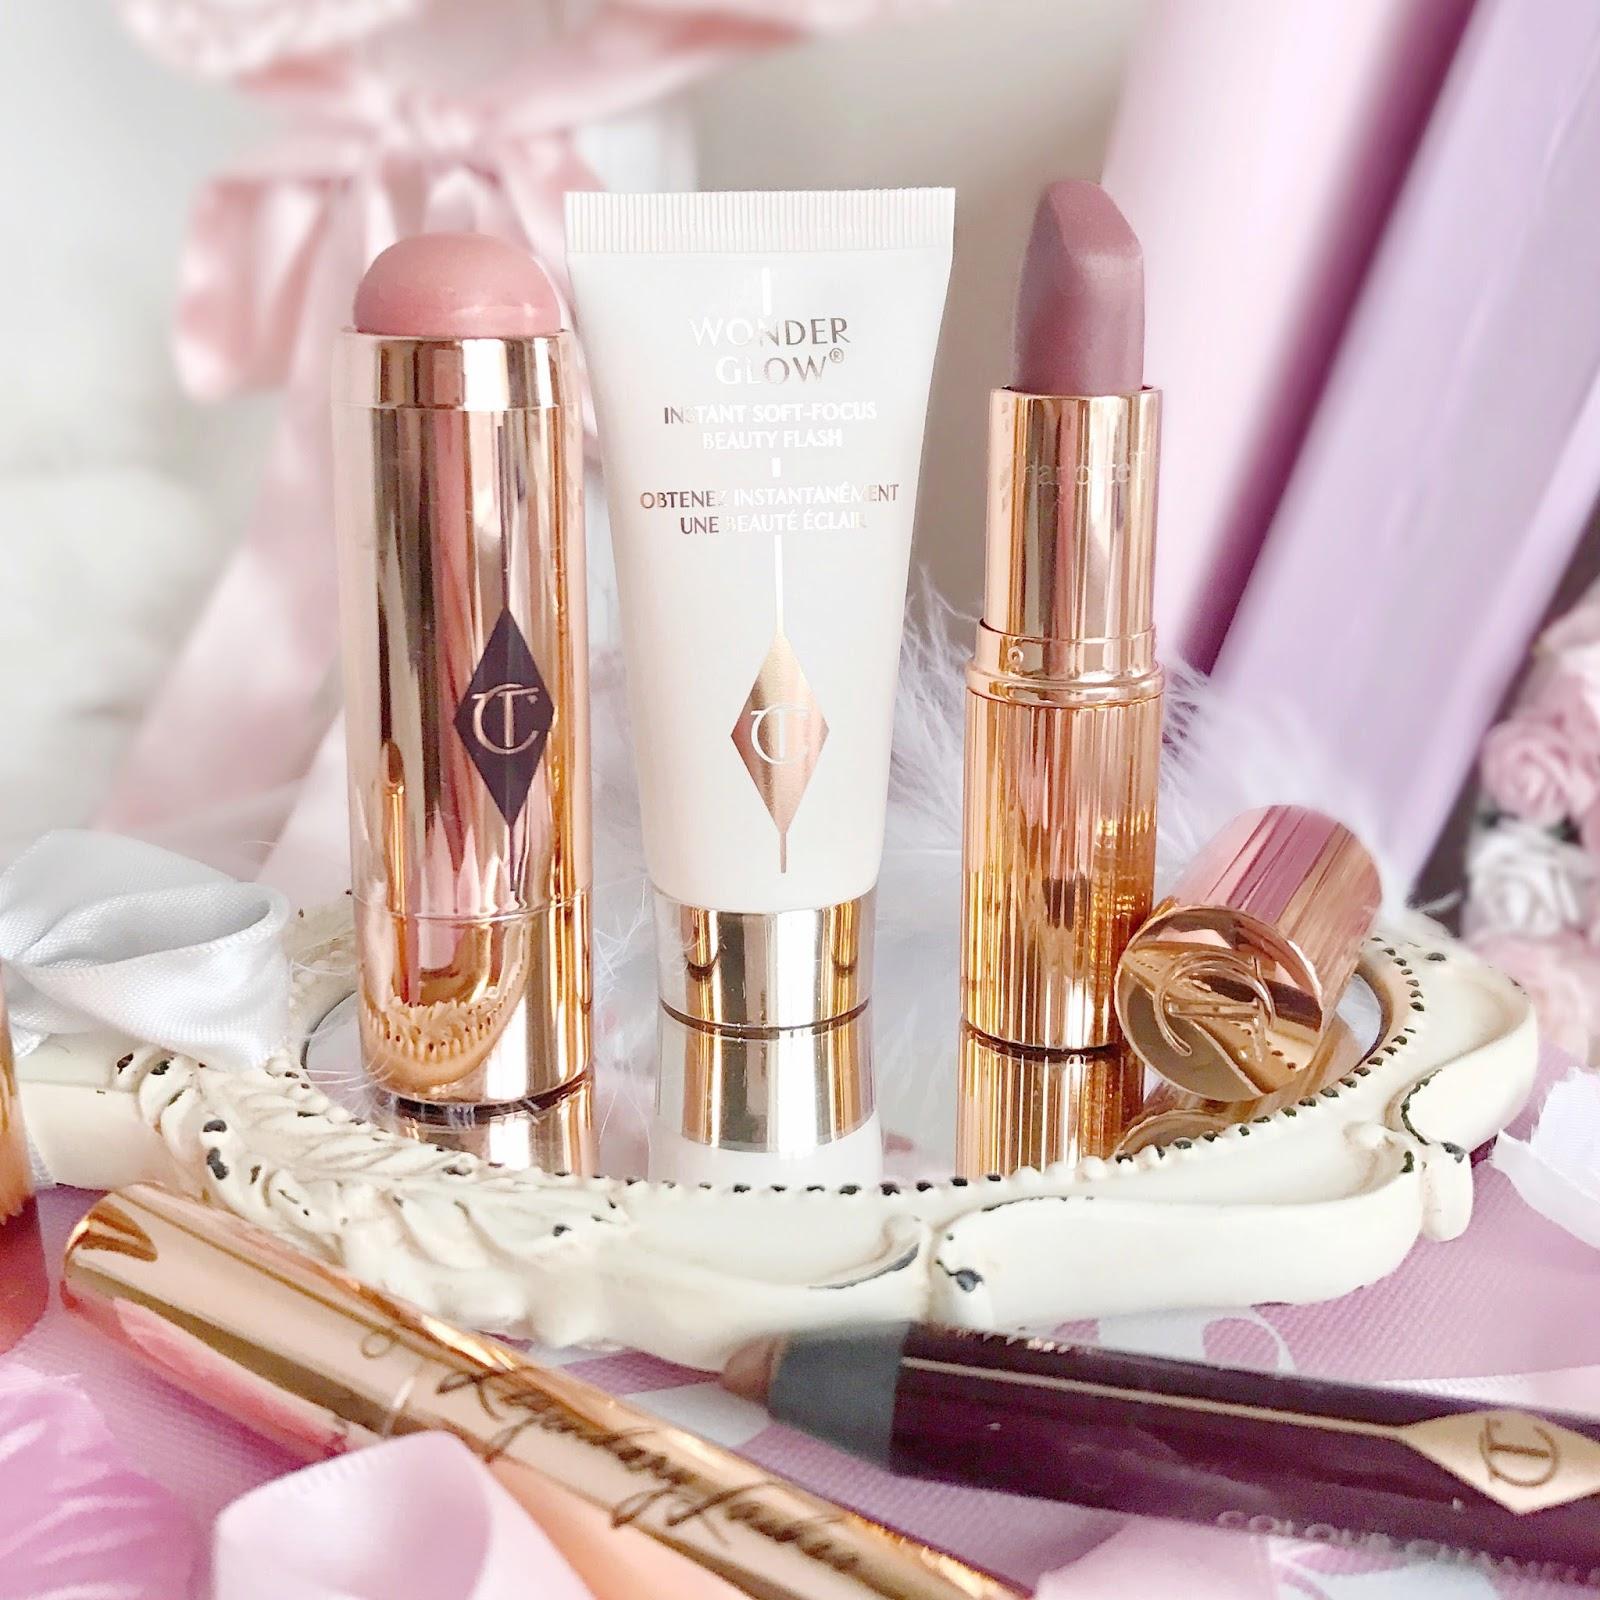 Charlotte Tilbury | Quick 'N' Easy Makeup Kit